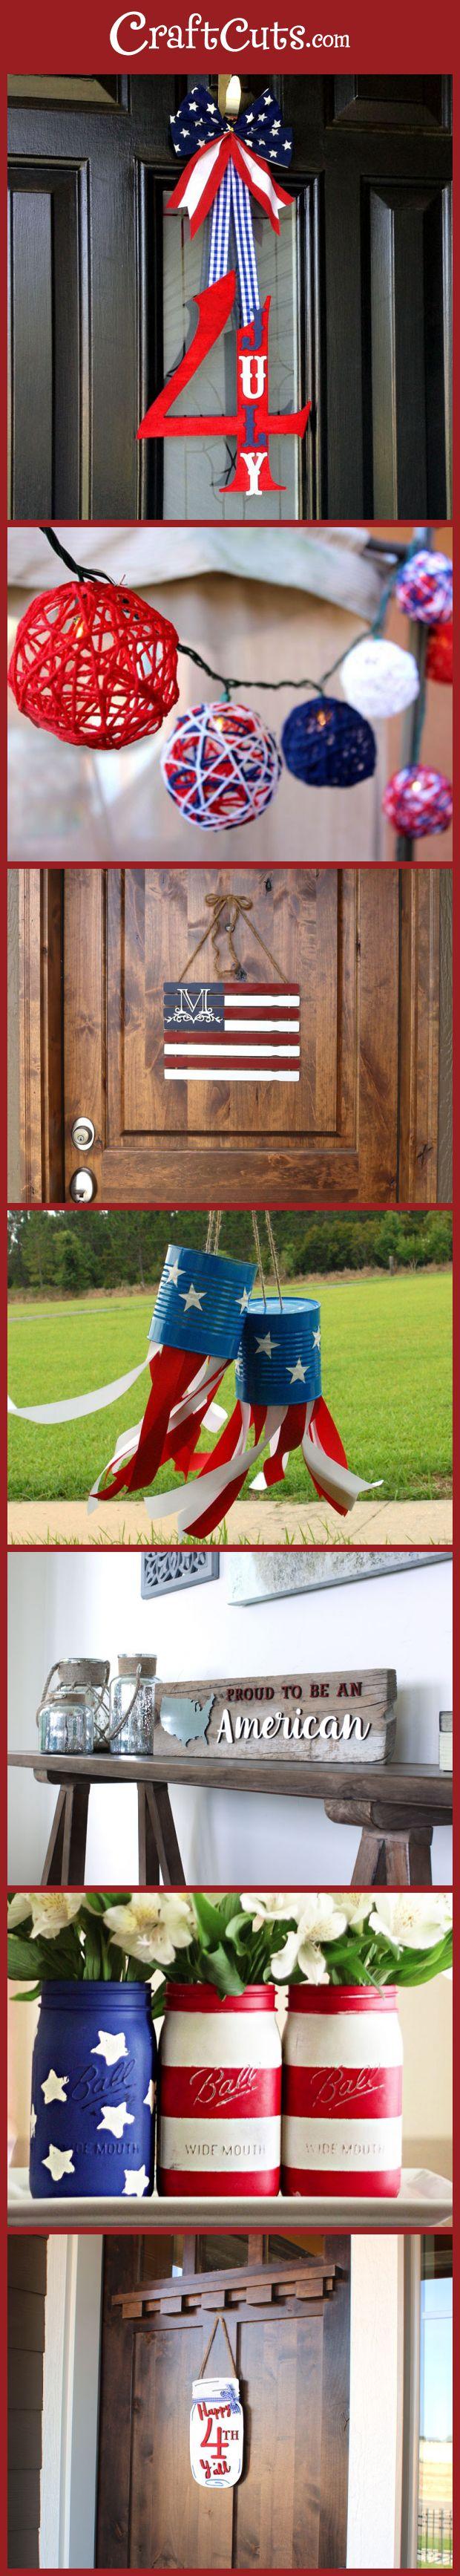 7 Patriotic DIY Ideas | 4th of July Crafts | CraftCuts.com